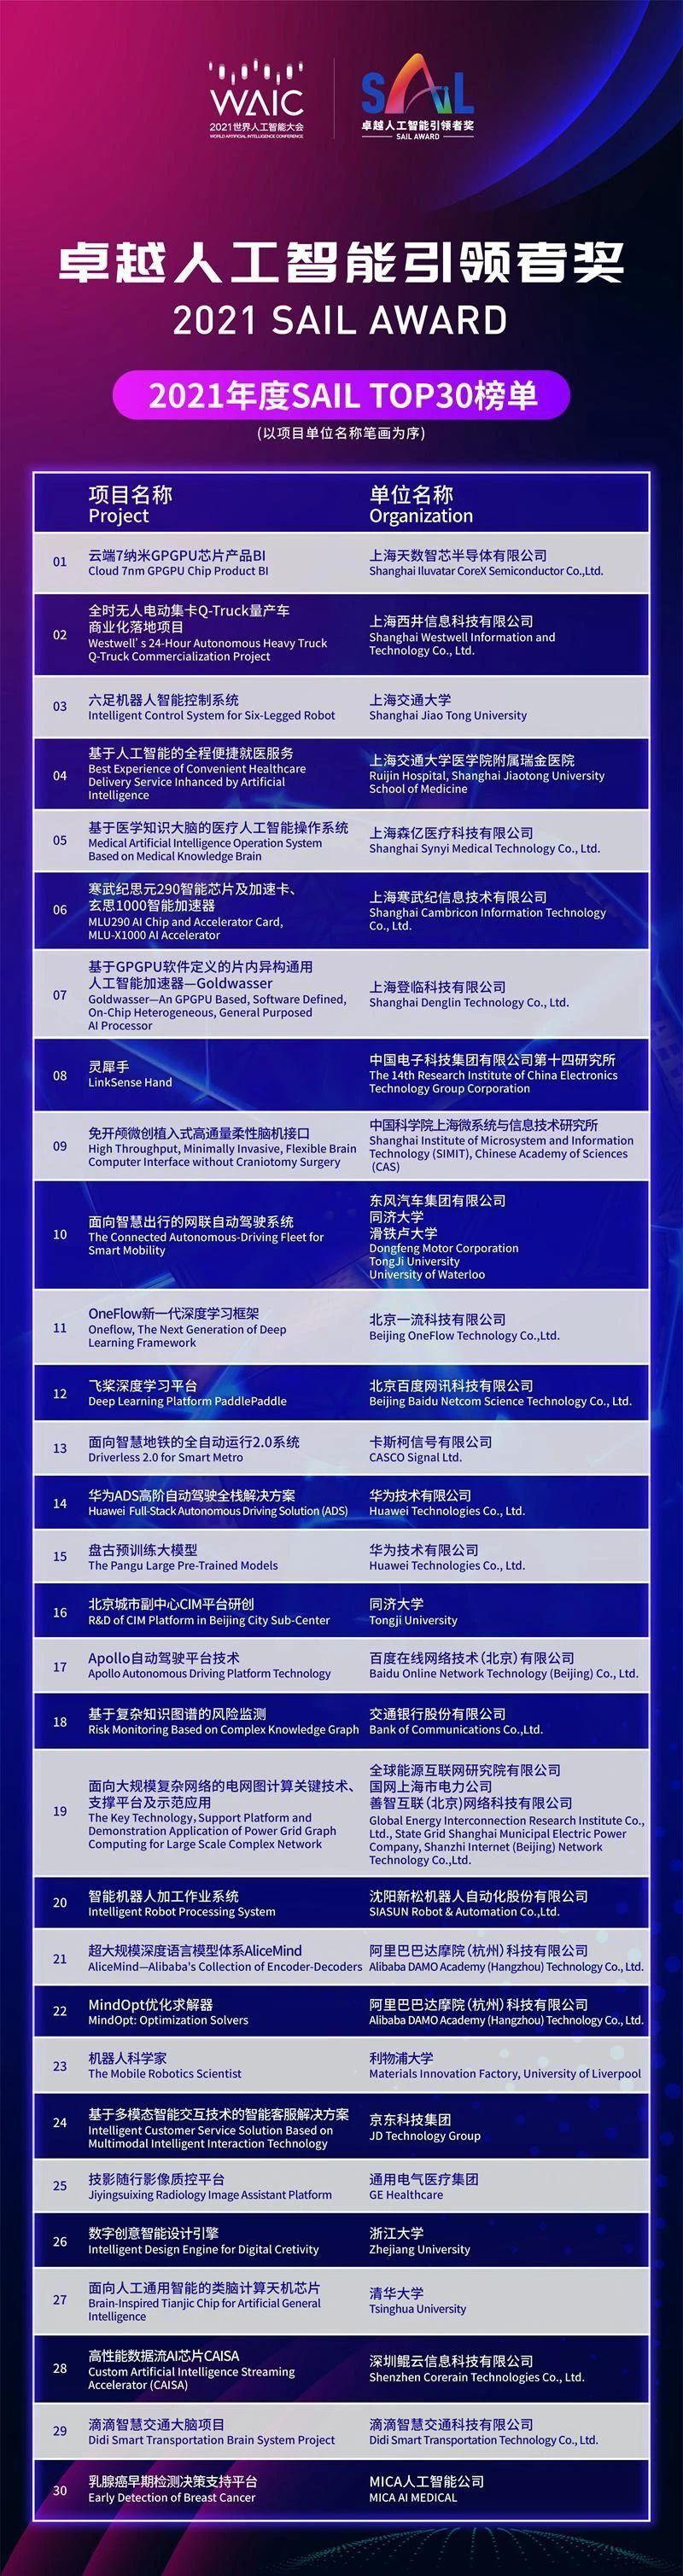 "OneFlow登上""2021世界人工智能大会SAIL奖Top 30""榜单"